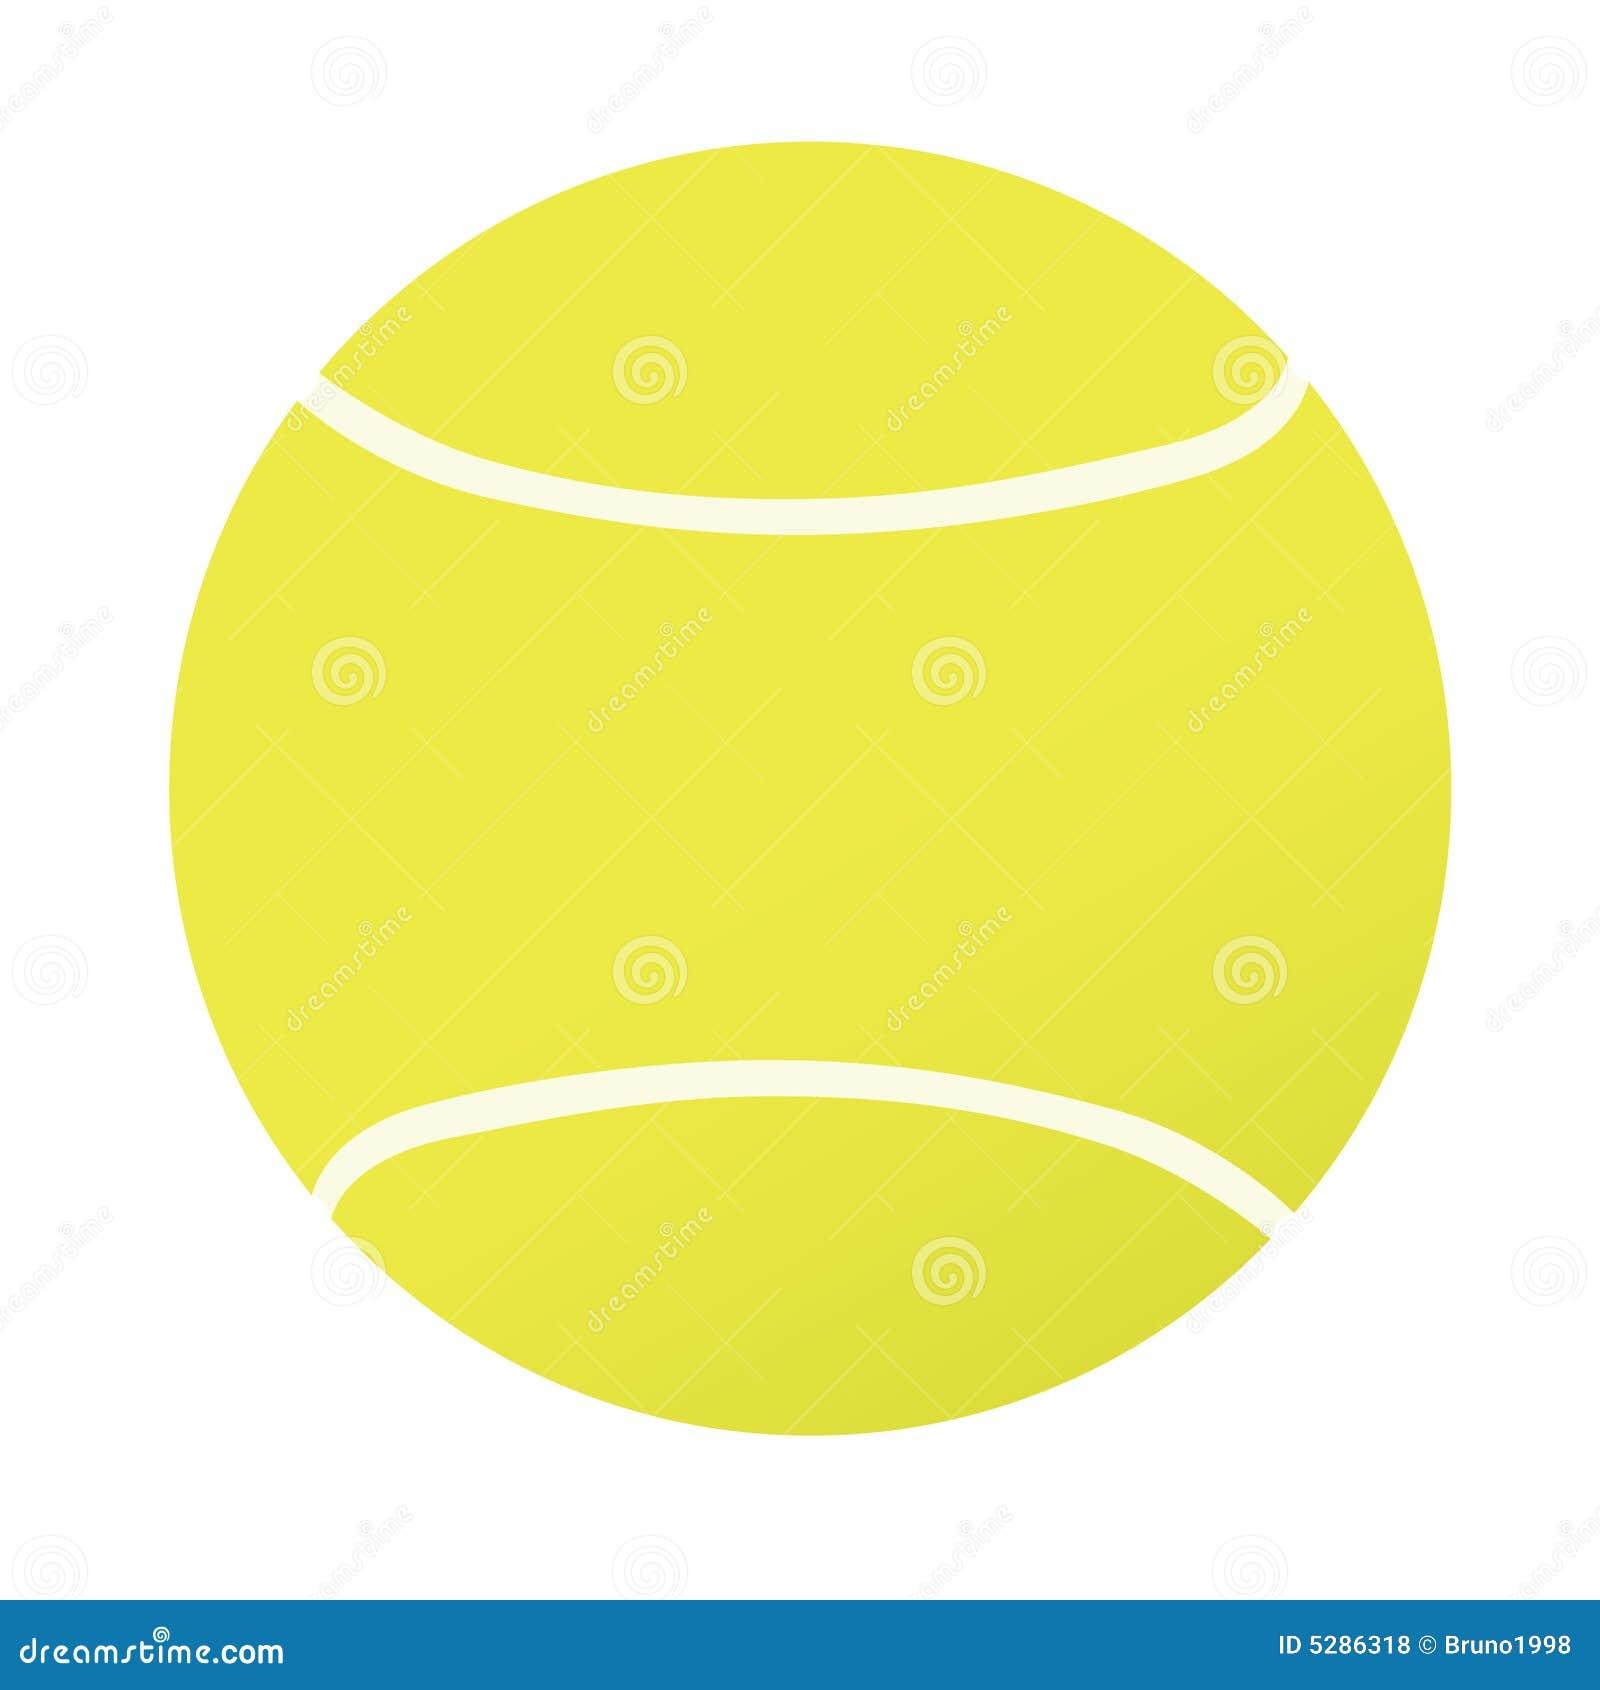 Tennis Ball Royalty Free Stock Photos Image 5286318